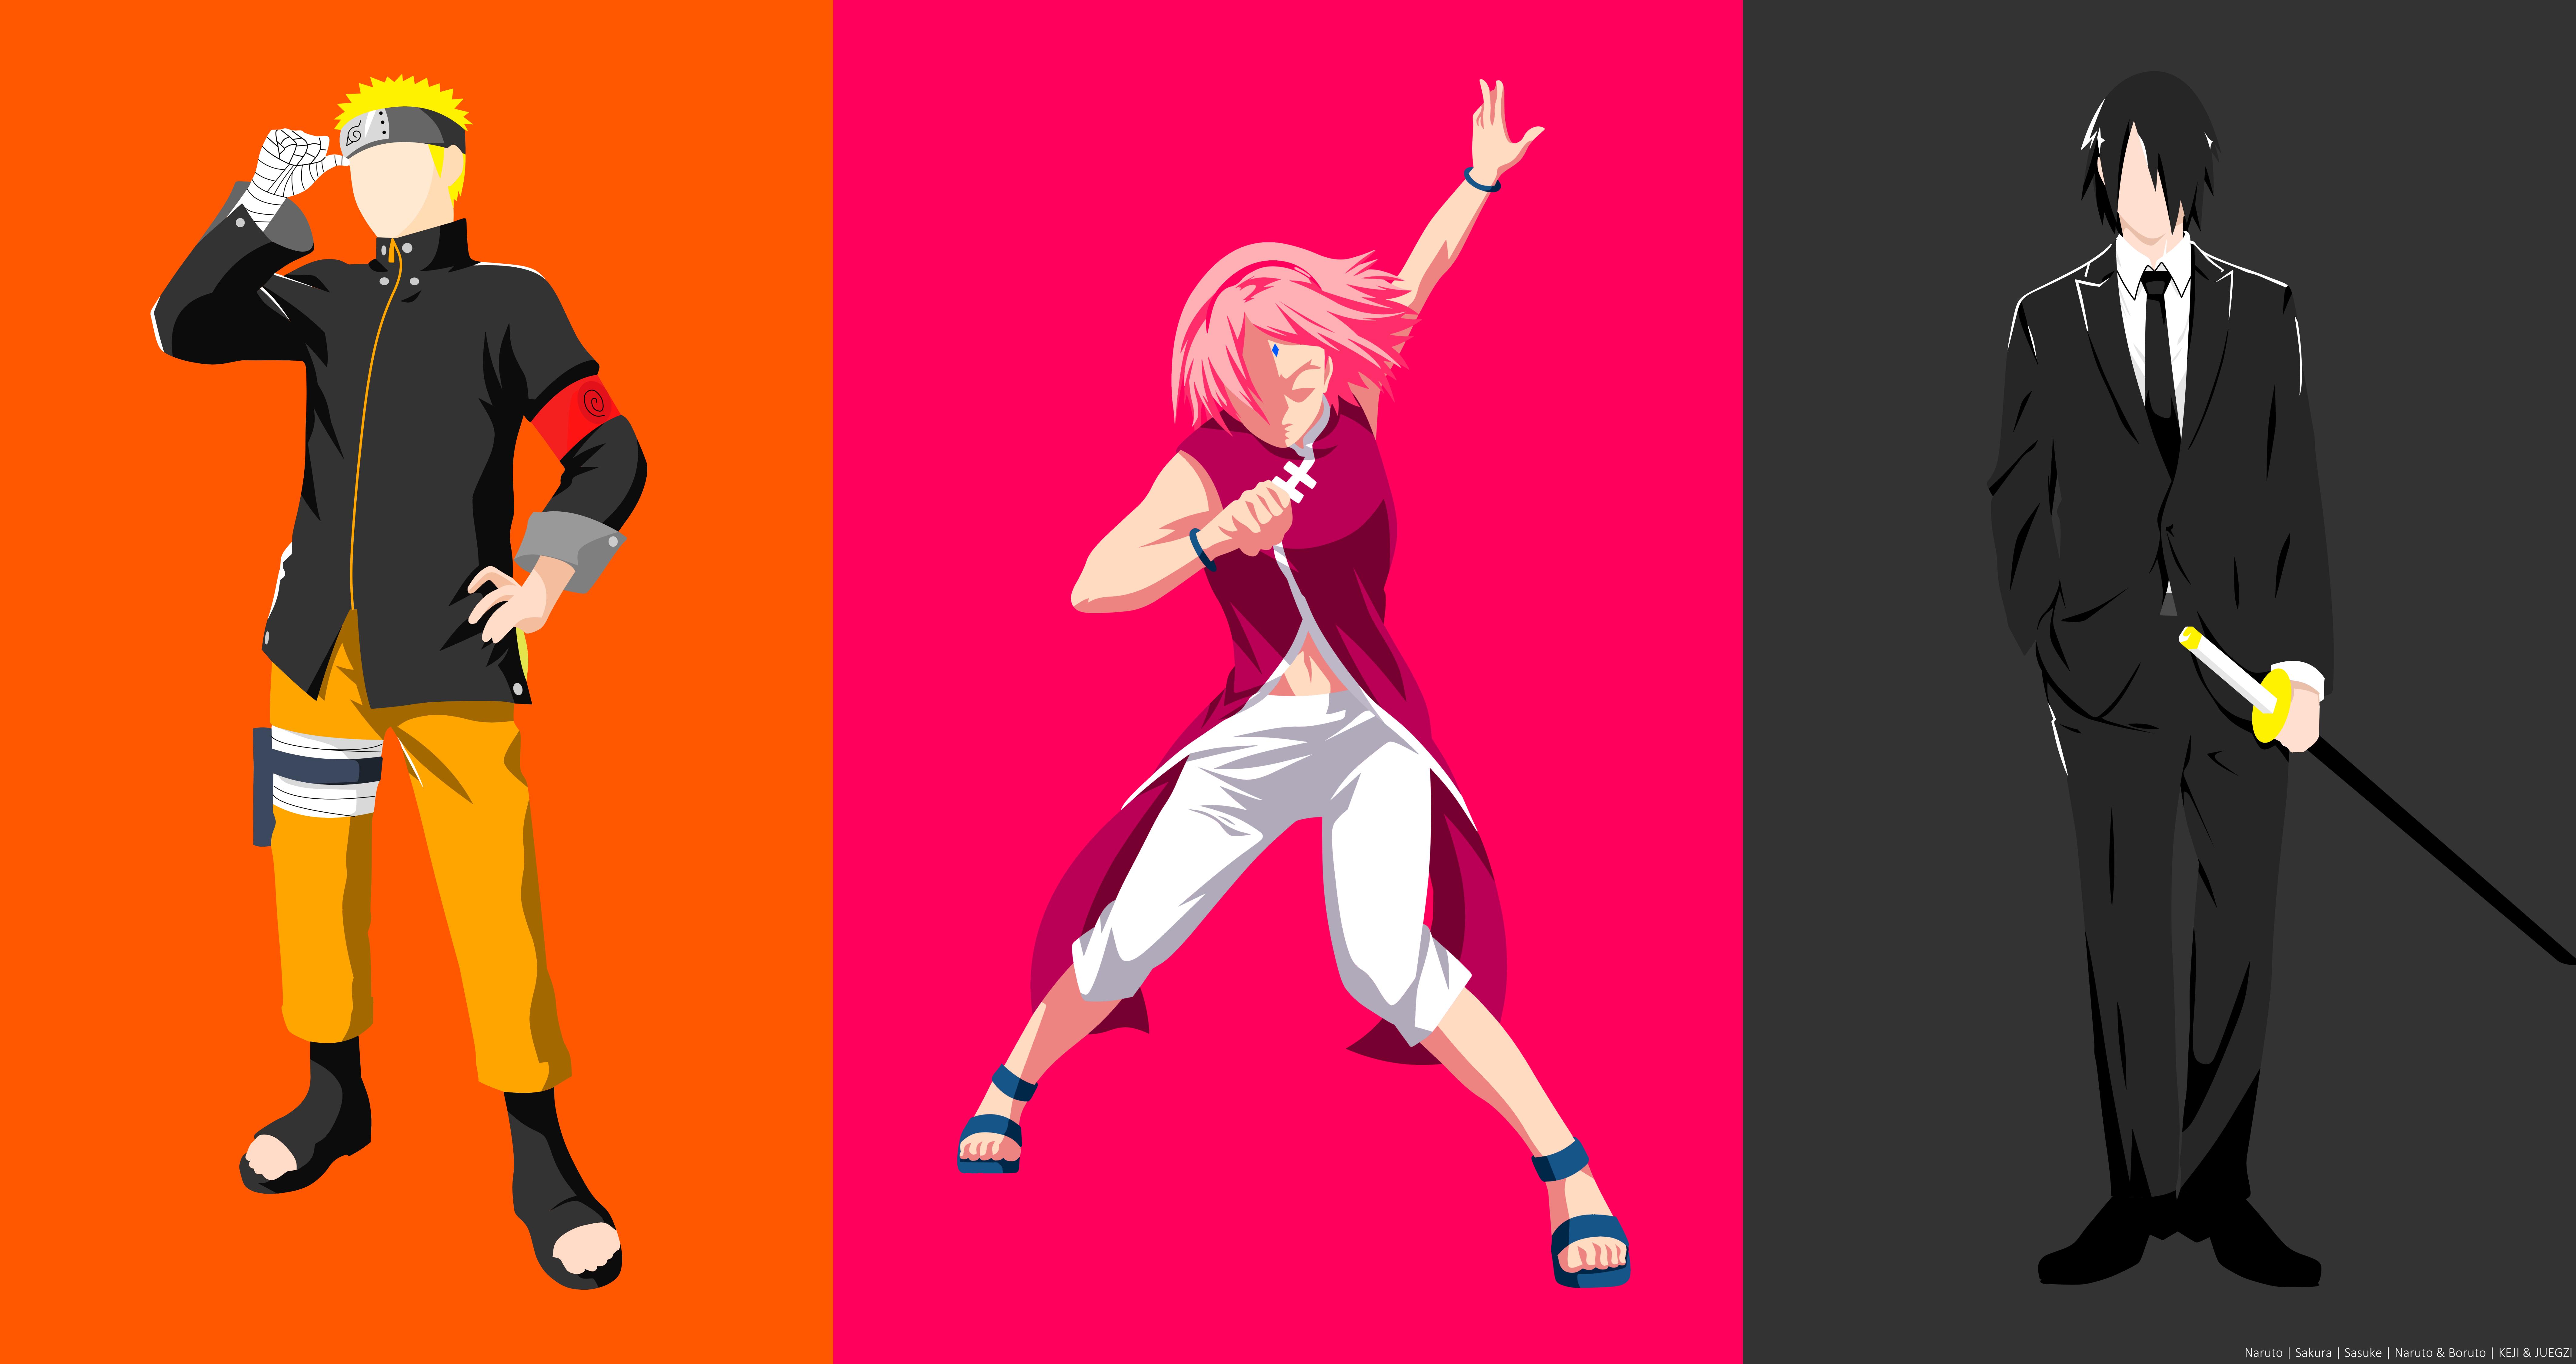 Black Hair Blonde Boruto Naruto Next Generations Boy Girl Minimalist Naruto Naruto Uzumaki Pink Hair 8500x4500